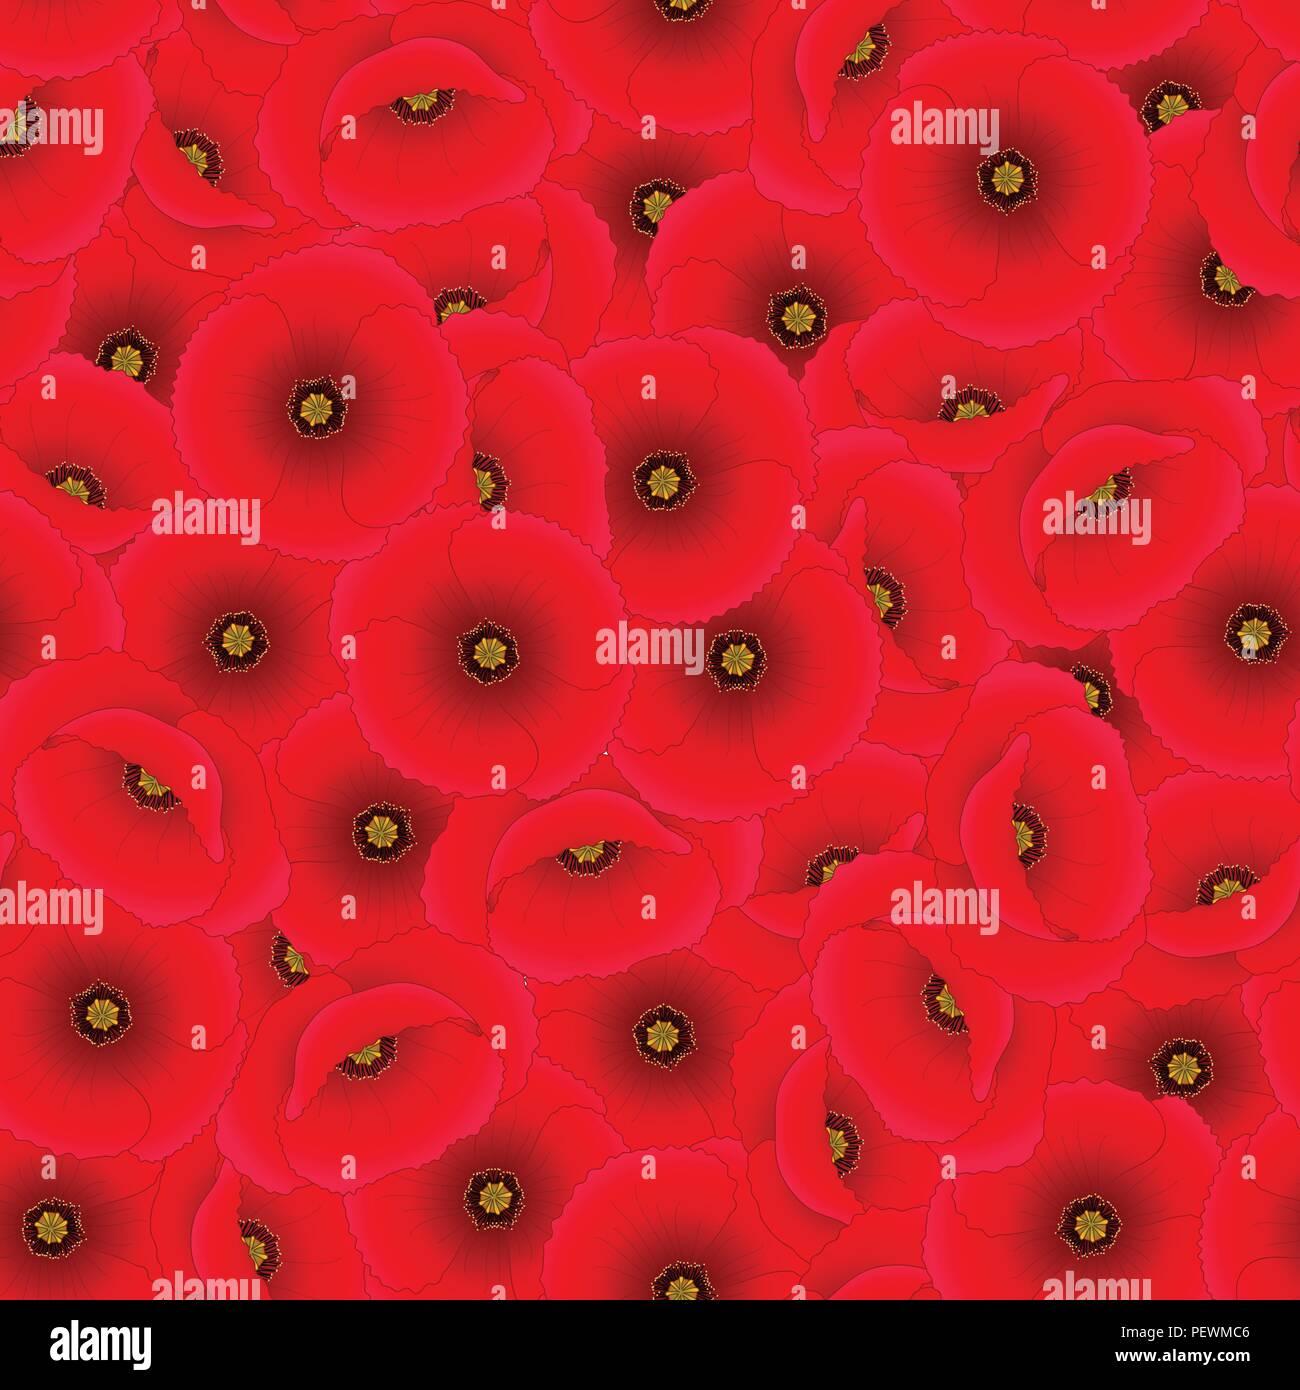 Papaver rhoeas Seamless Background or common poppy,corn poppy,corn rose,field poppy,Flanders poppy or red poppy. Vector Illustration. - Stock Vector